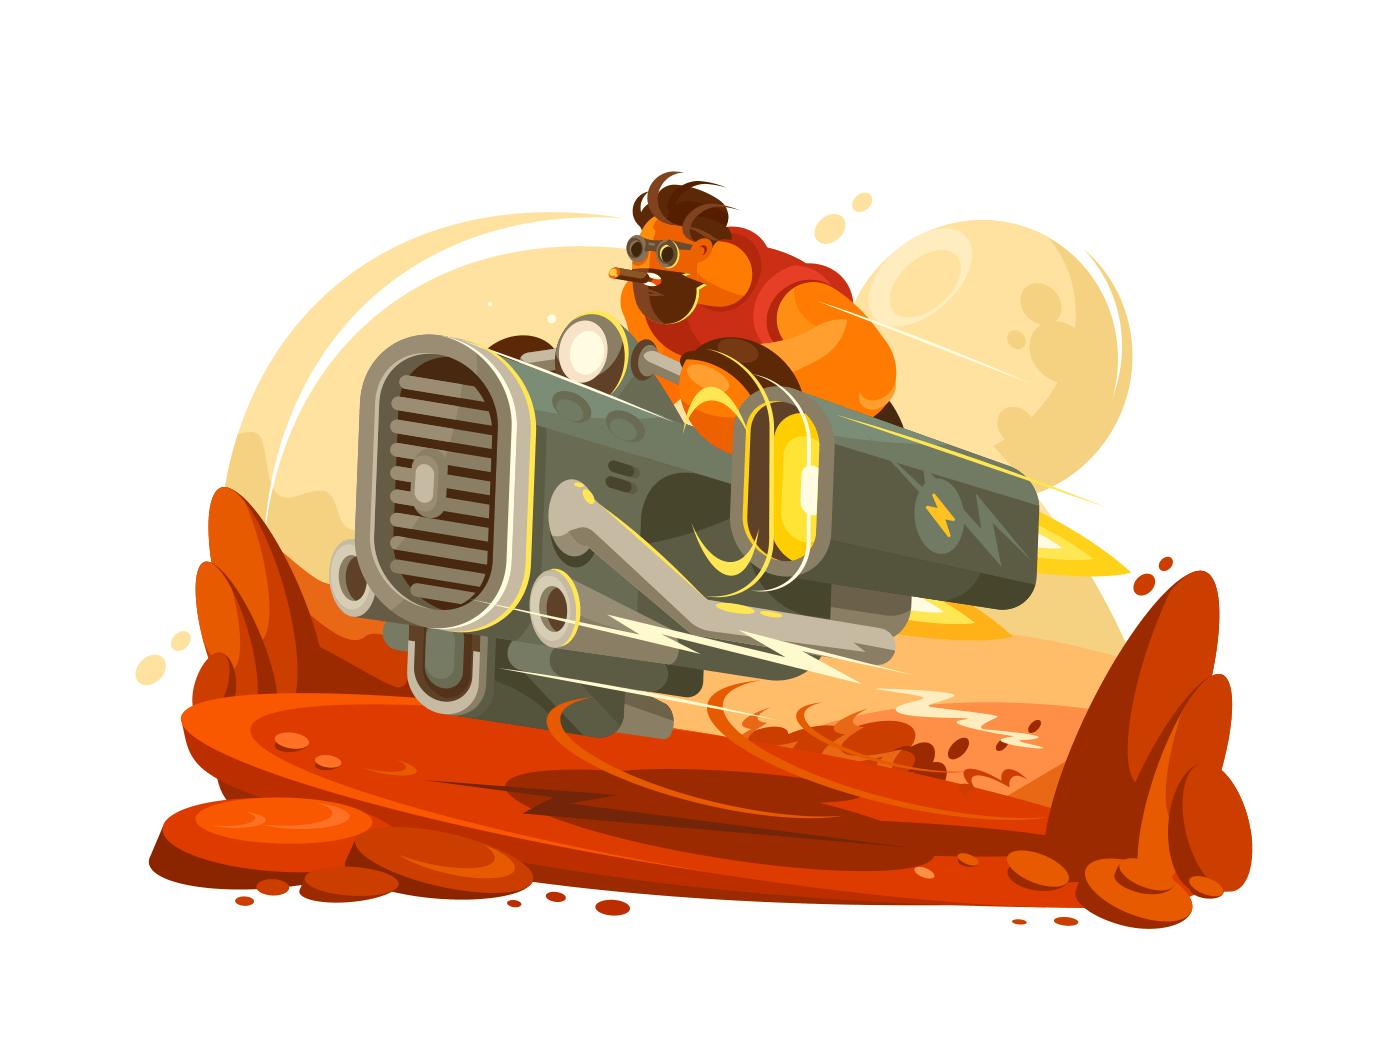 Space traveler explores planet illustration